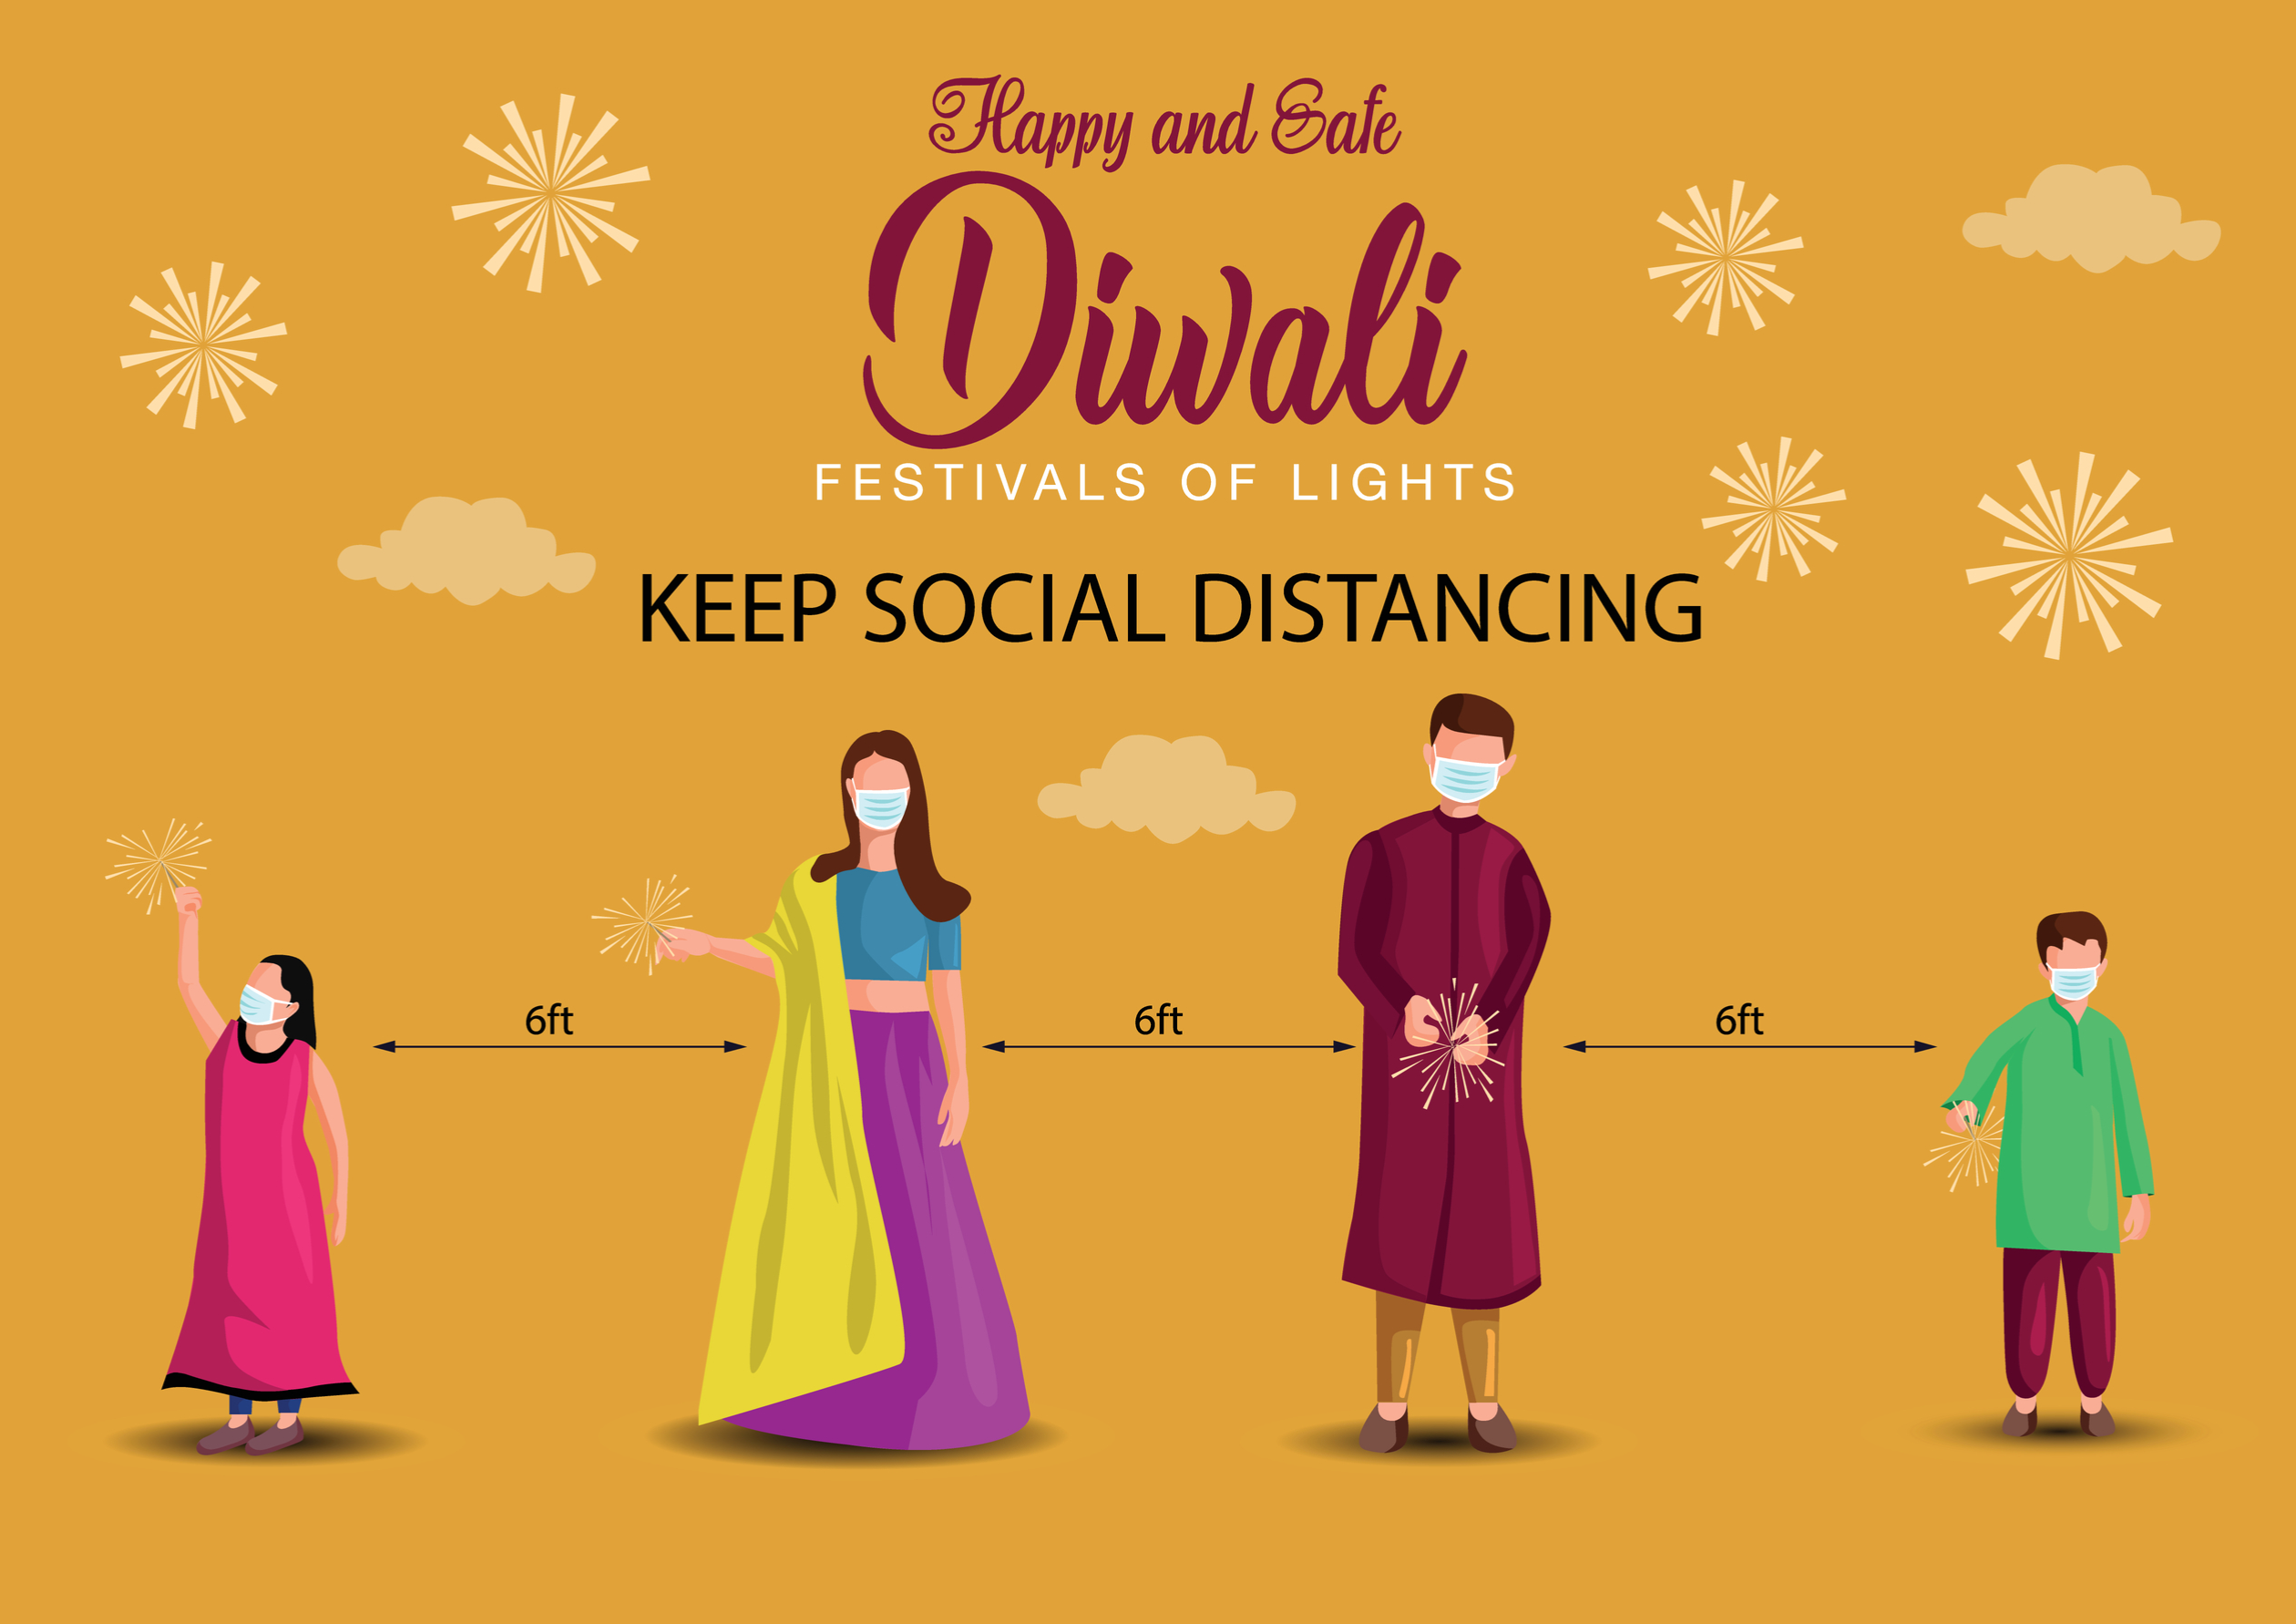 Celebrate Covid Safe Diwali says Health Officials